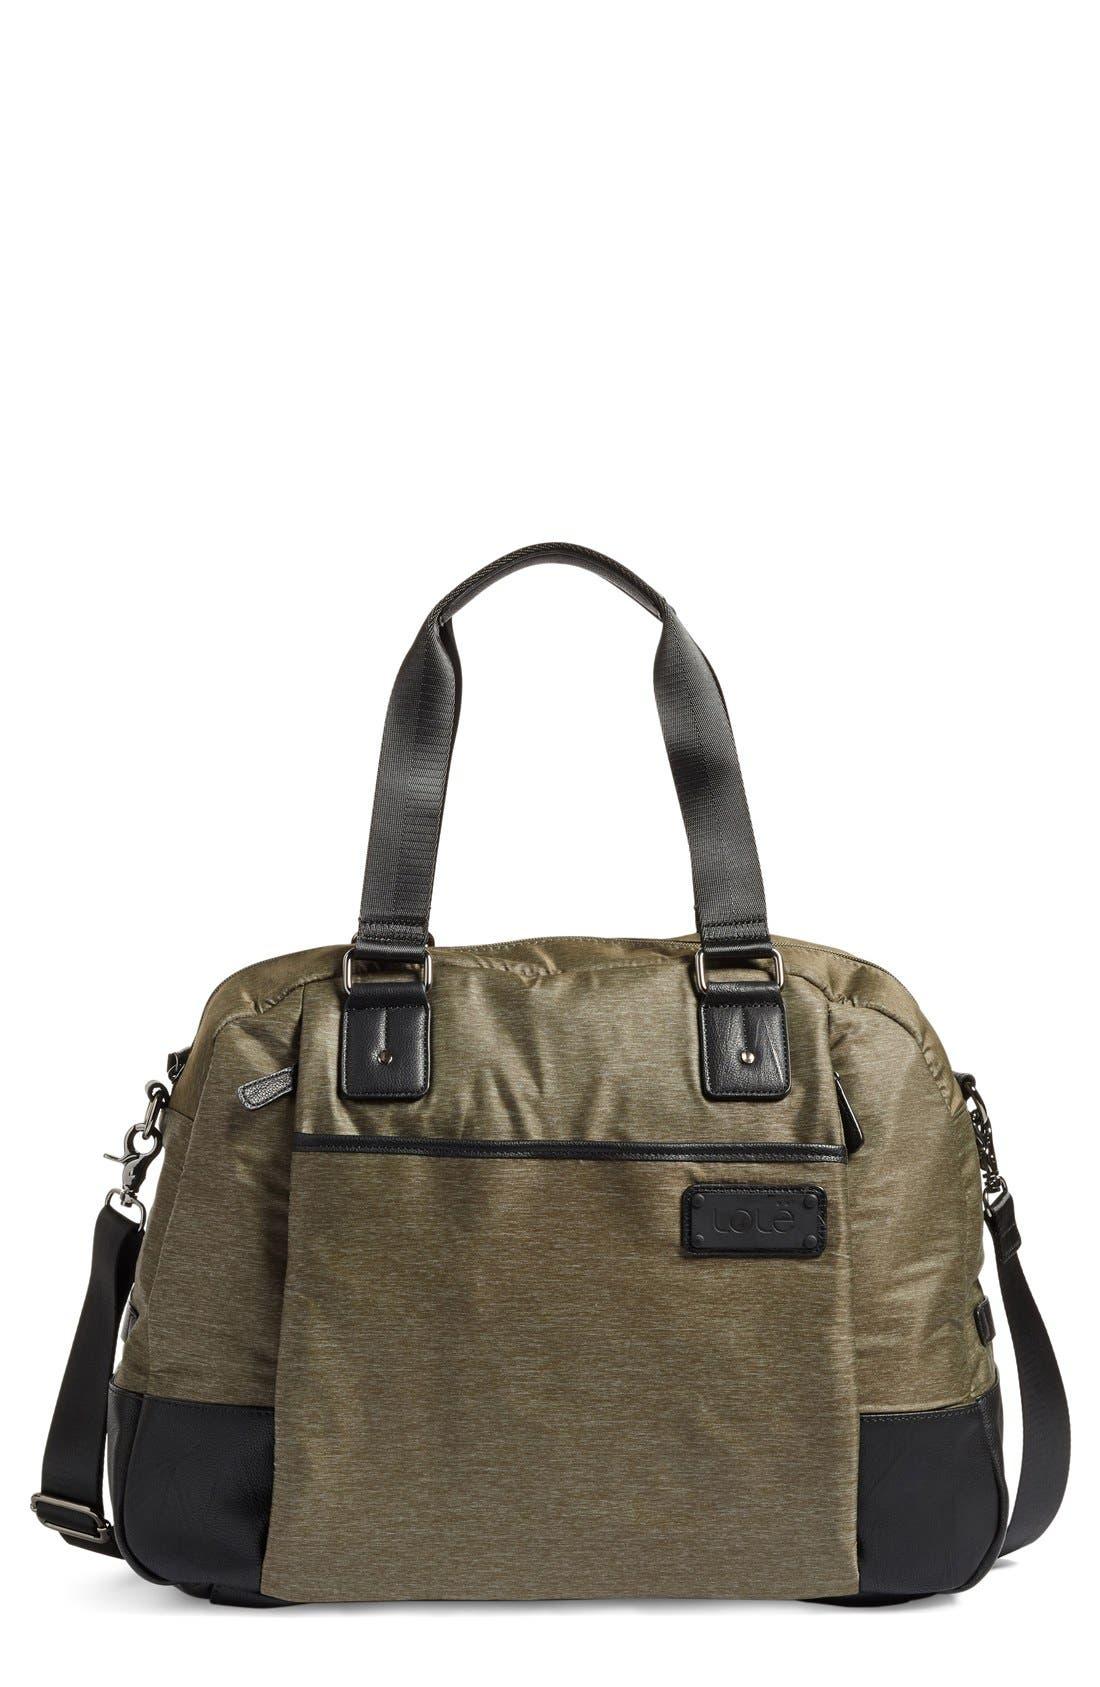 Alternate Image 1 Selected - Lole Deena Duffel Bag